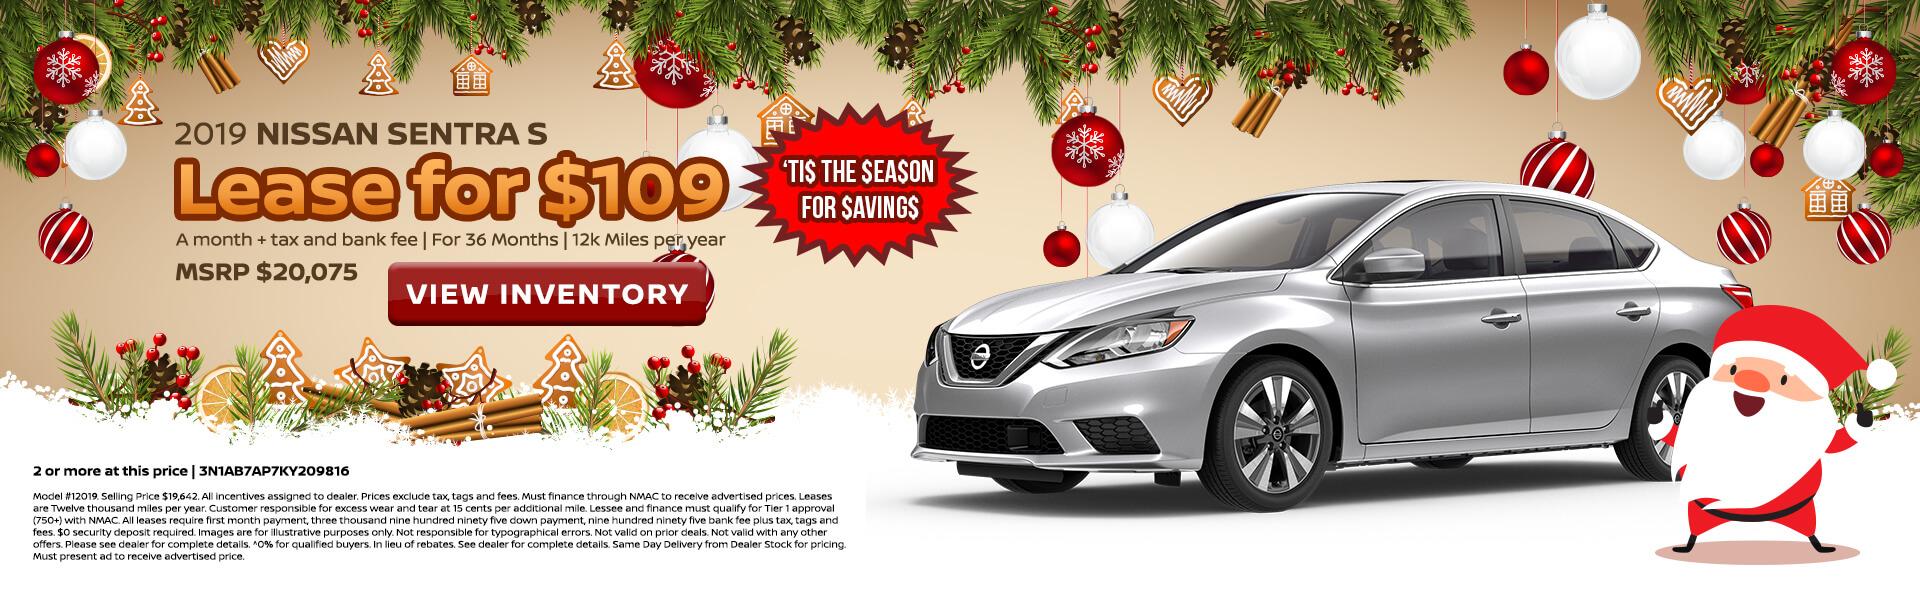 Nissan Sentra $109 Lease